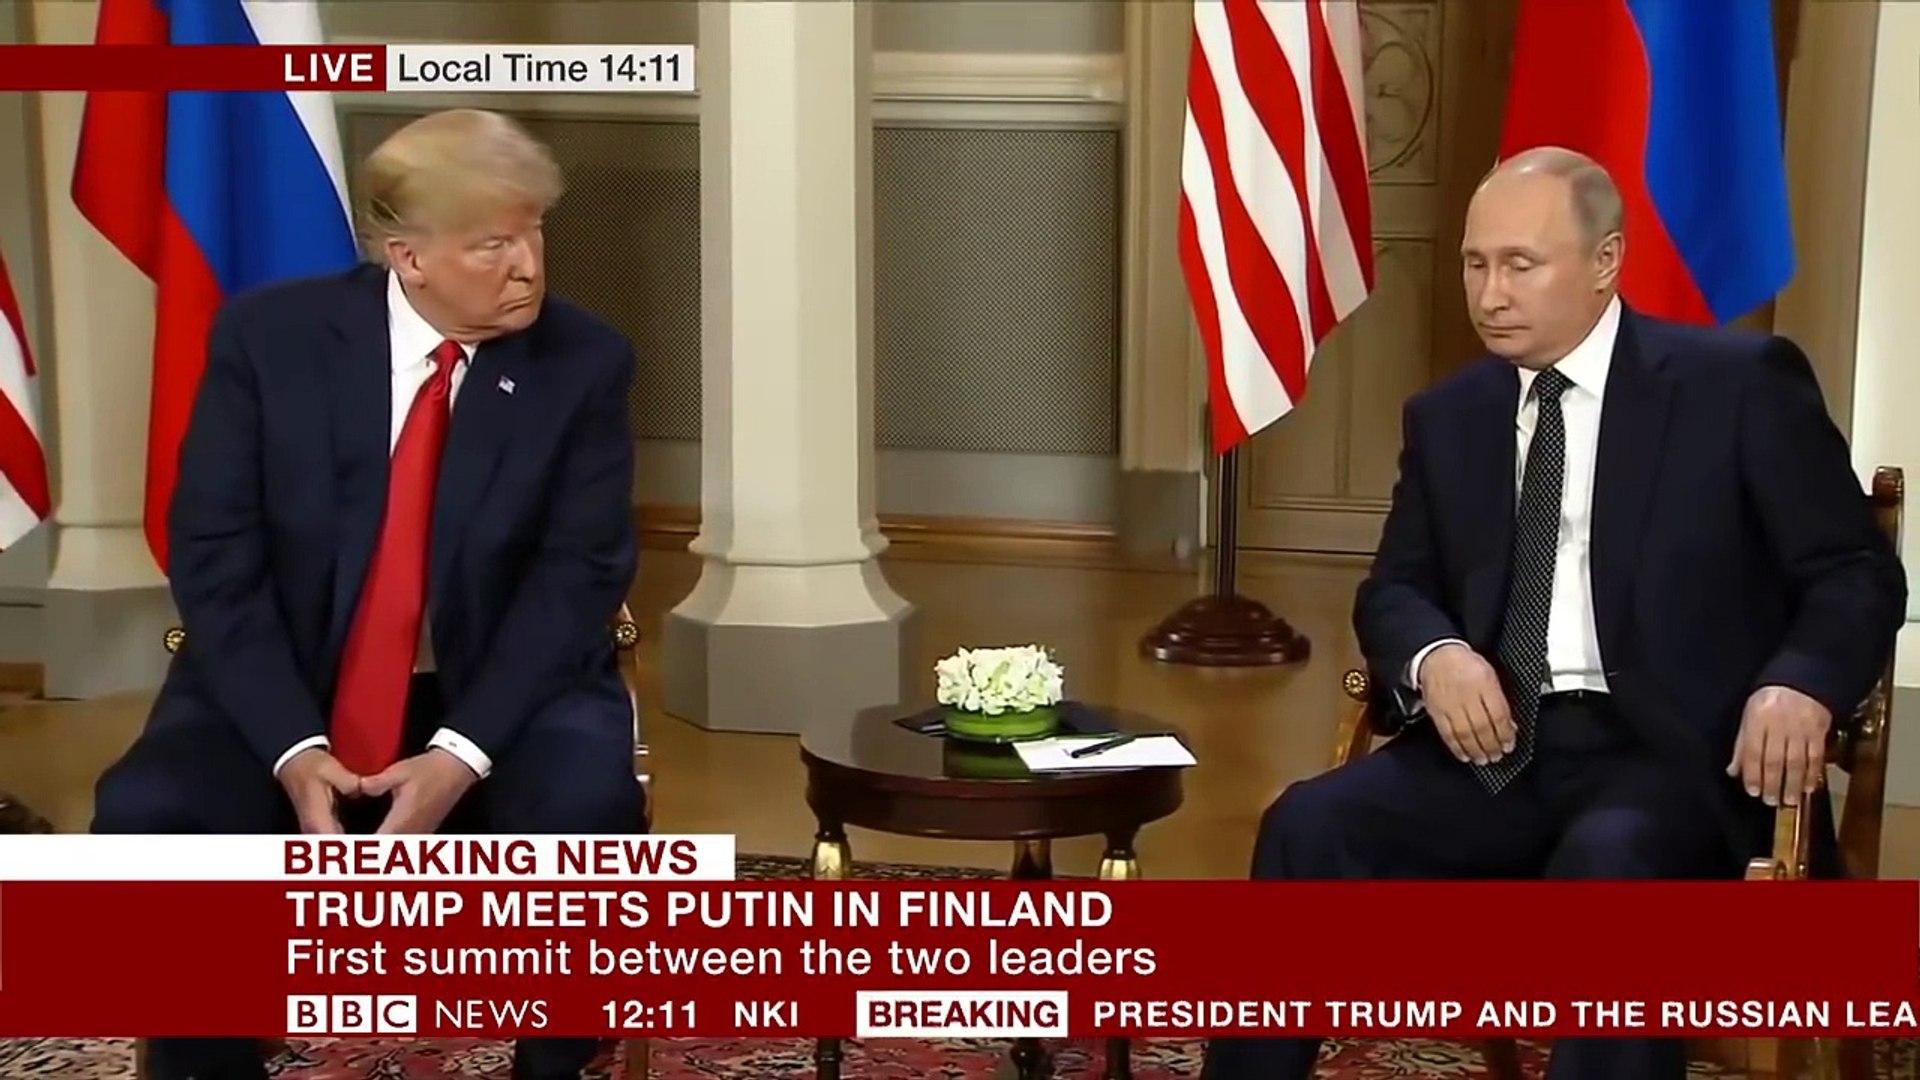 BREAKING NEWS- Trump and Putin meeting begins- BBC News